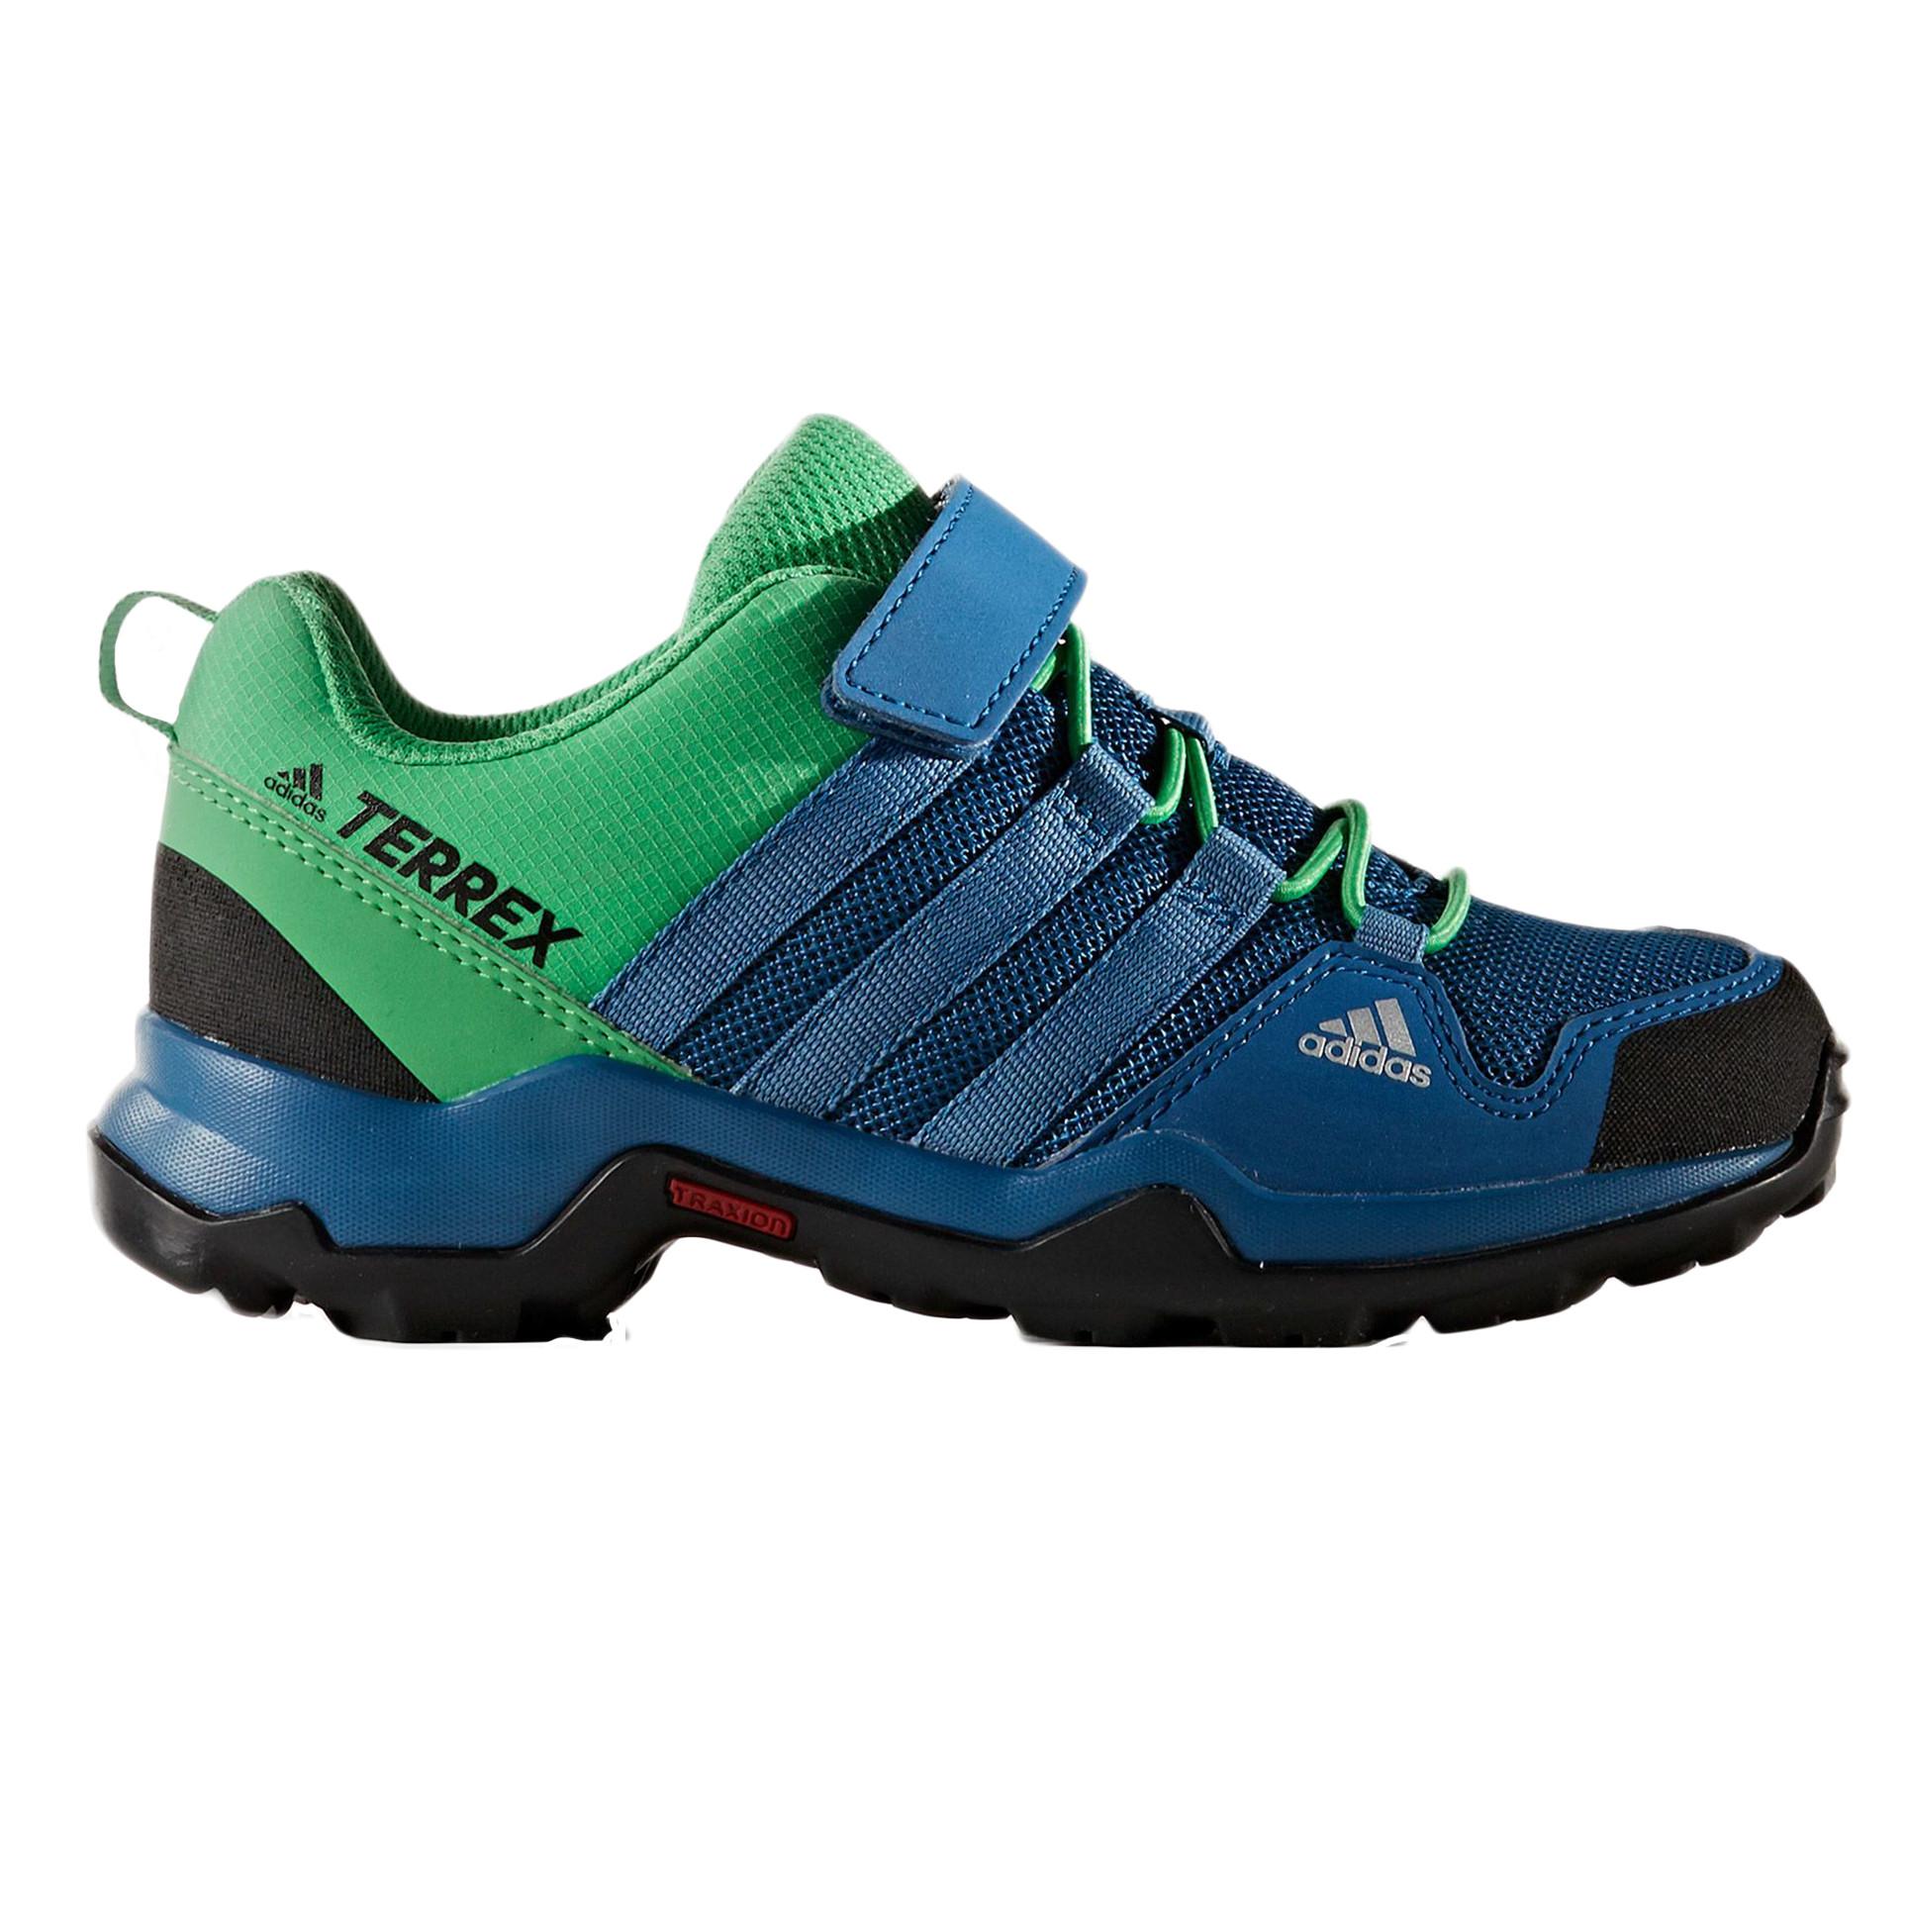 chaussure randonnee adidas enfant